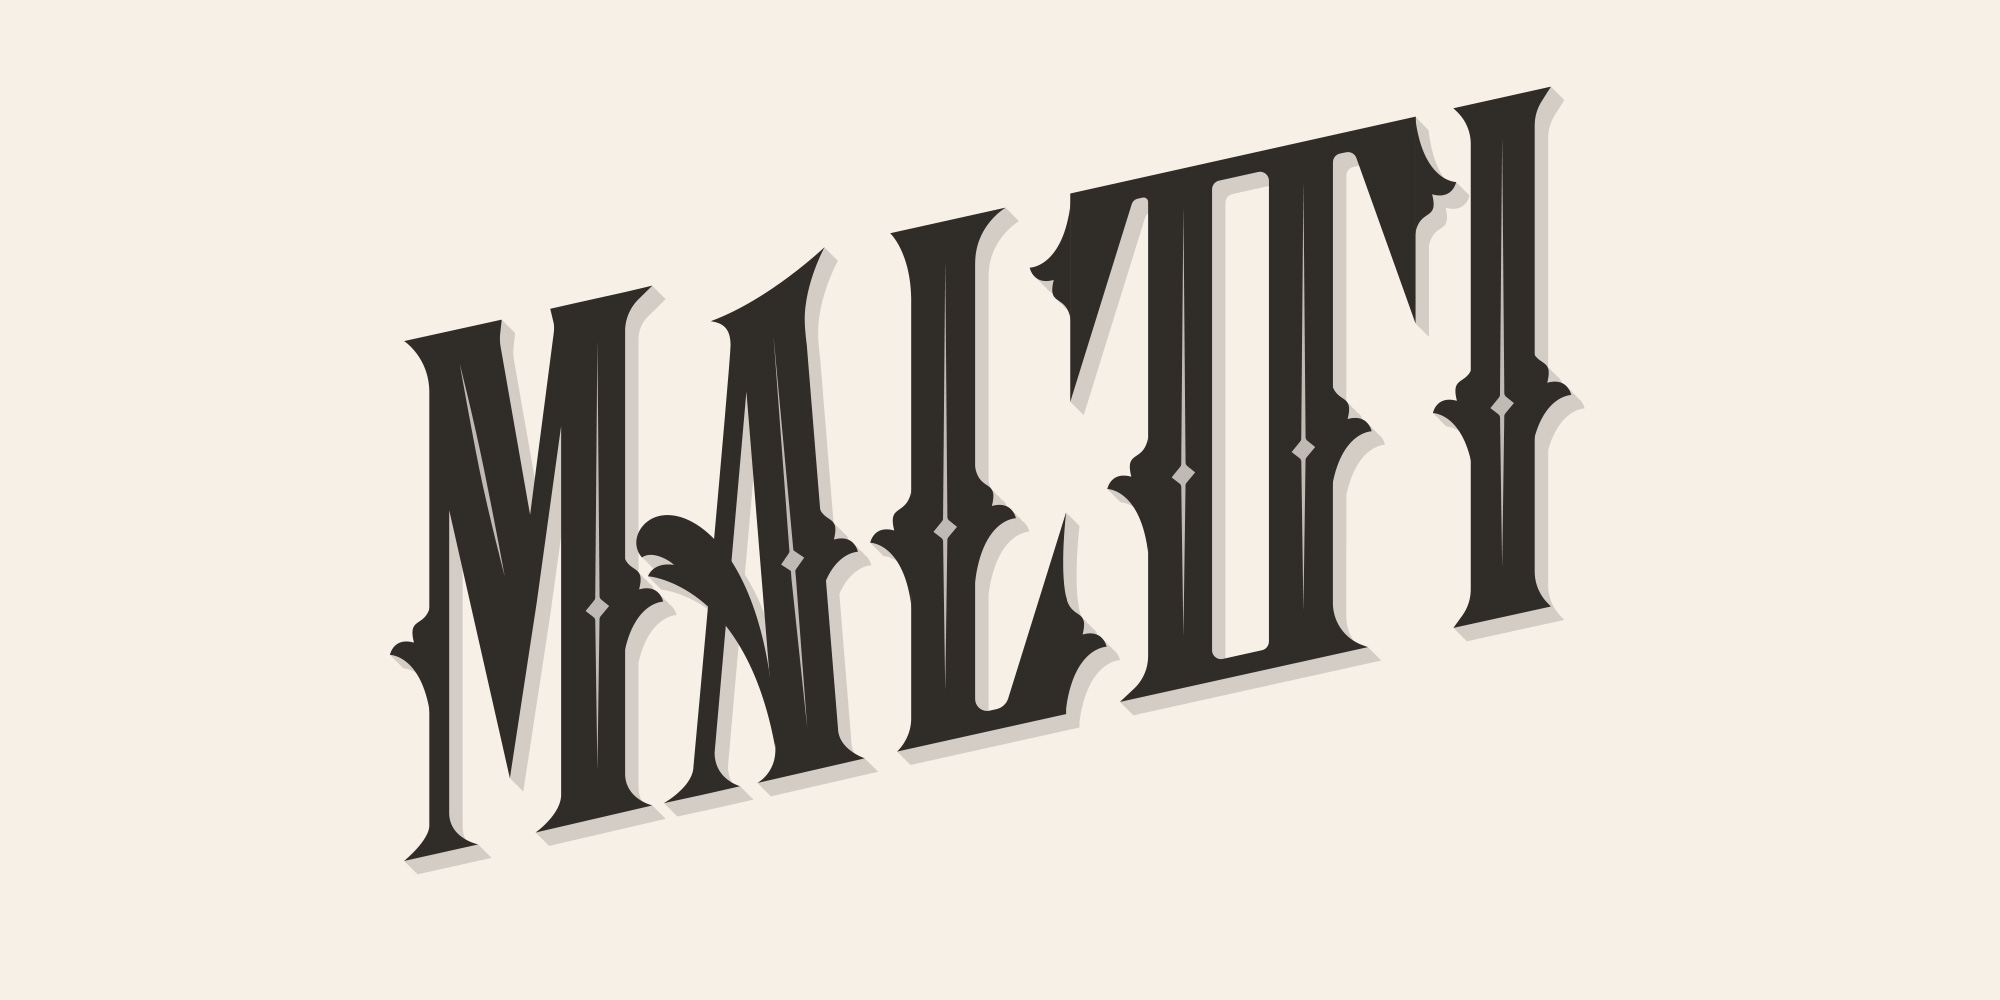 Maltti type